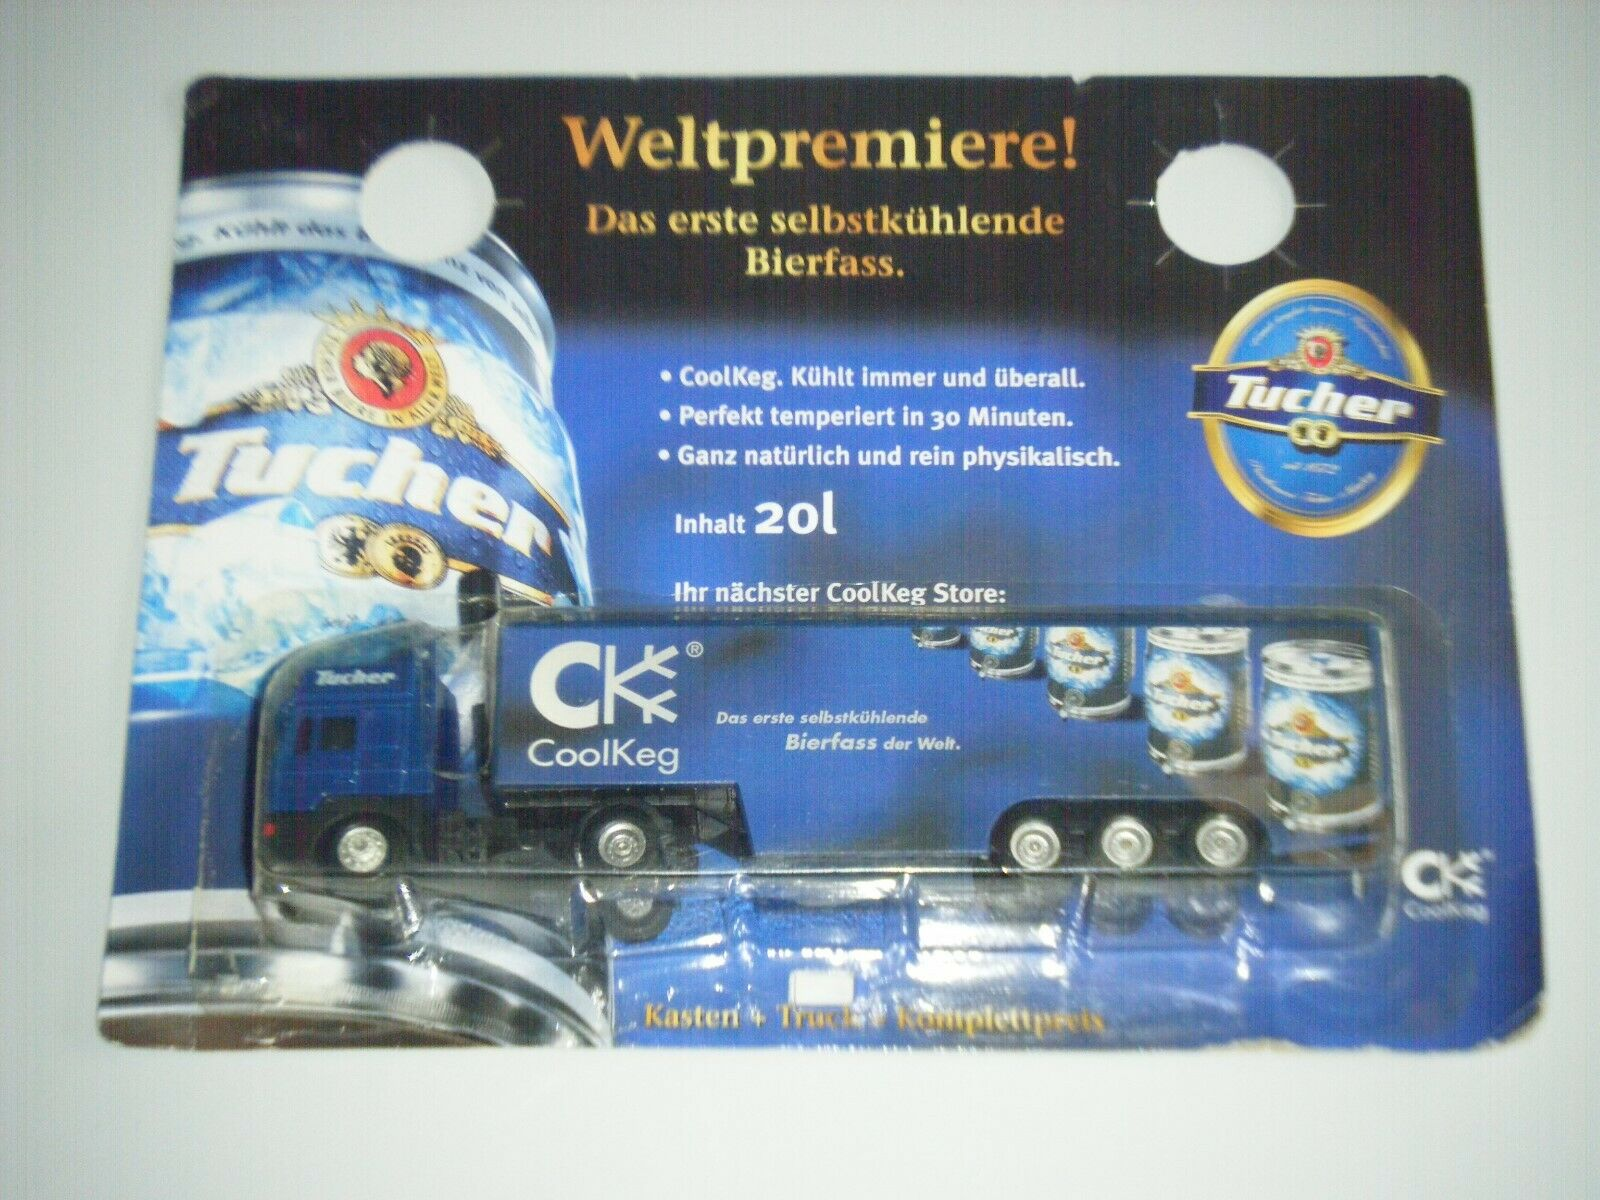 NEU Lkw  MAN / Sattelzug   * TUCHER *  Bier- Transporter Werbetruck  CoolKeg OVP